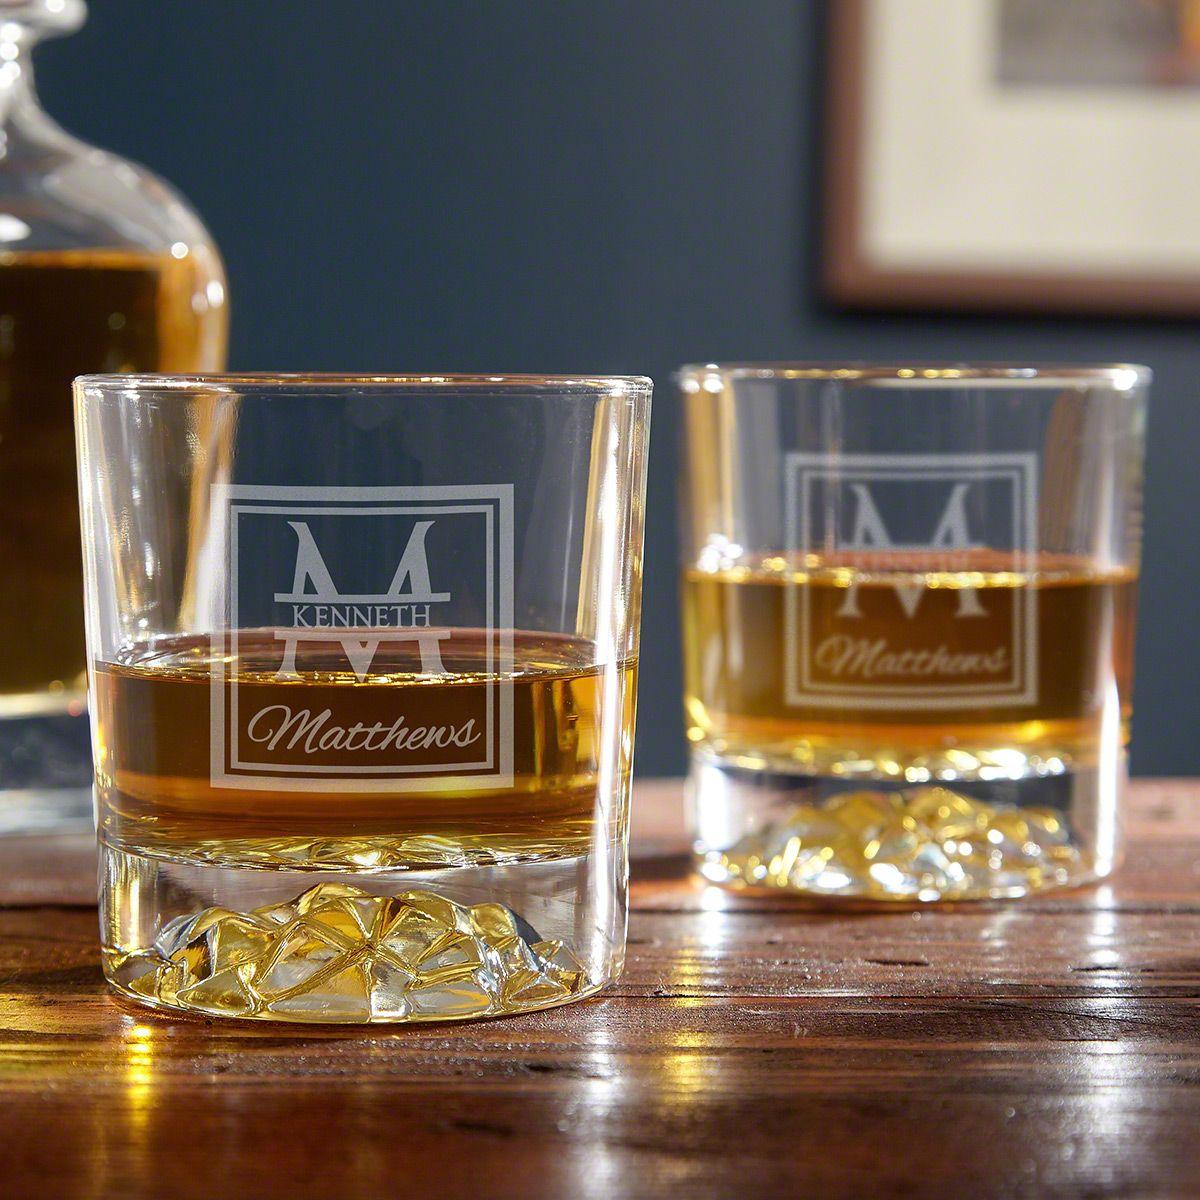 Oakhill Personalized Fairbanks Whiskey Glasses, Set of 2